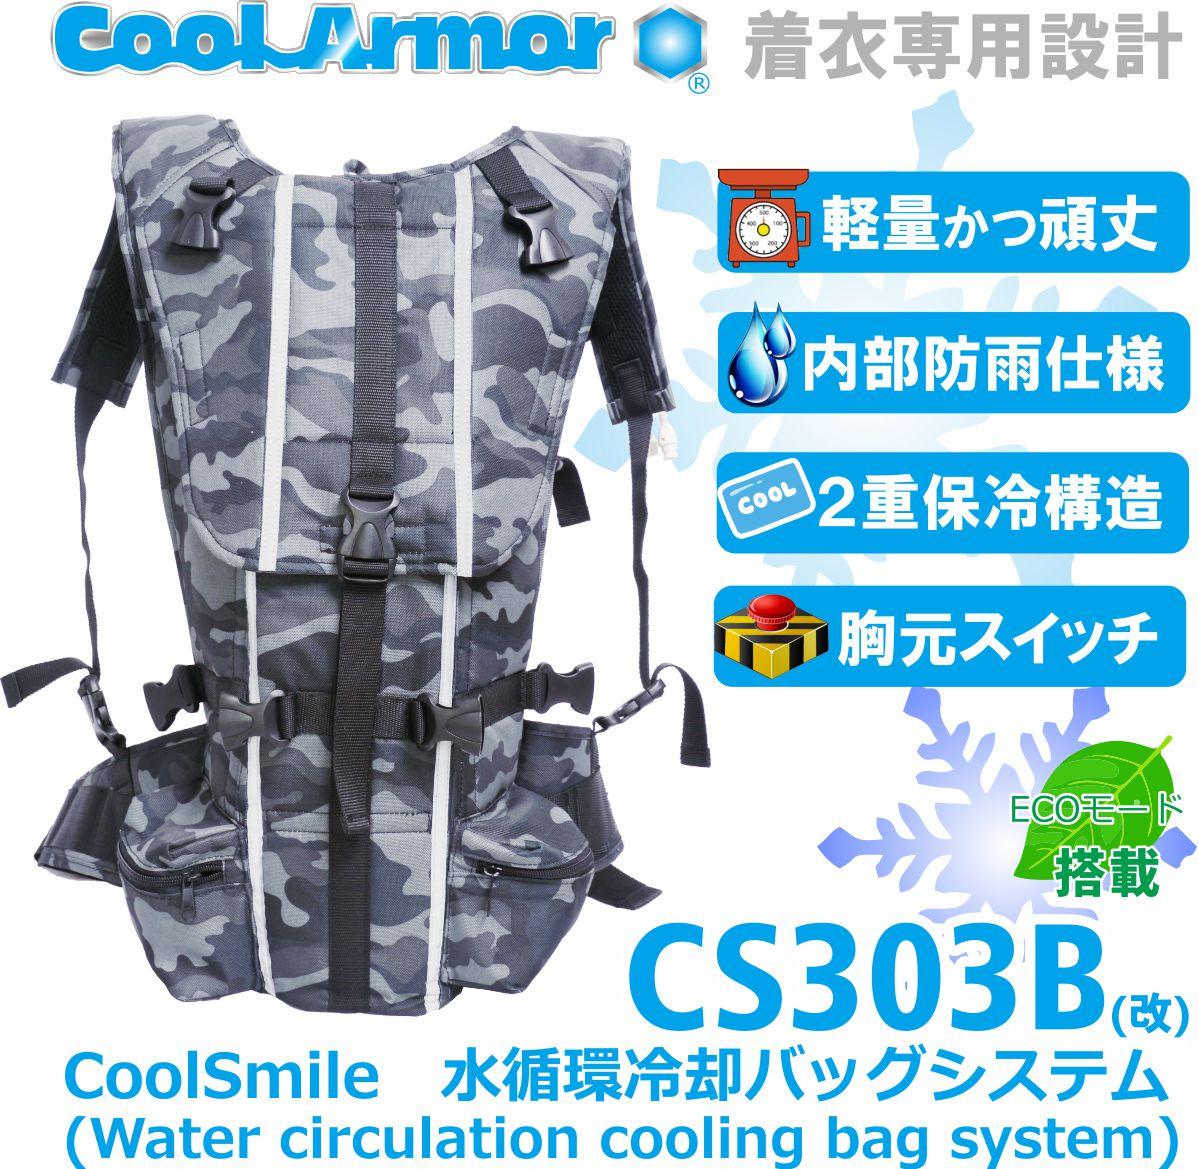 CoolSmile 水循環冷却バッグシステム(Water circulation cooling bag system)CS303B改